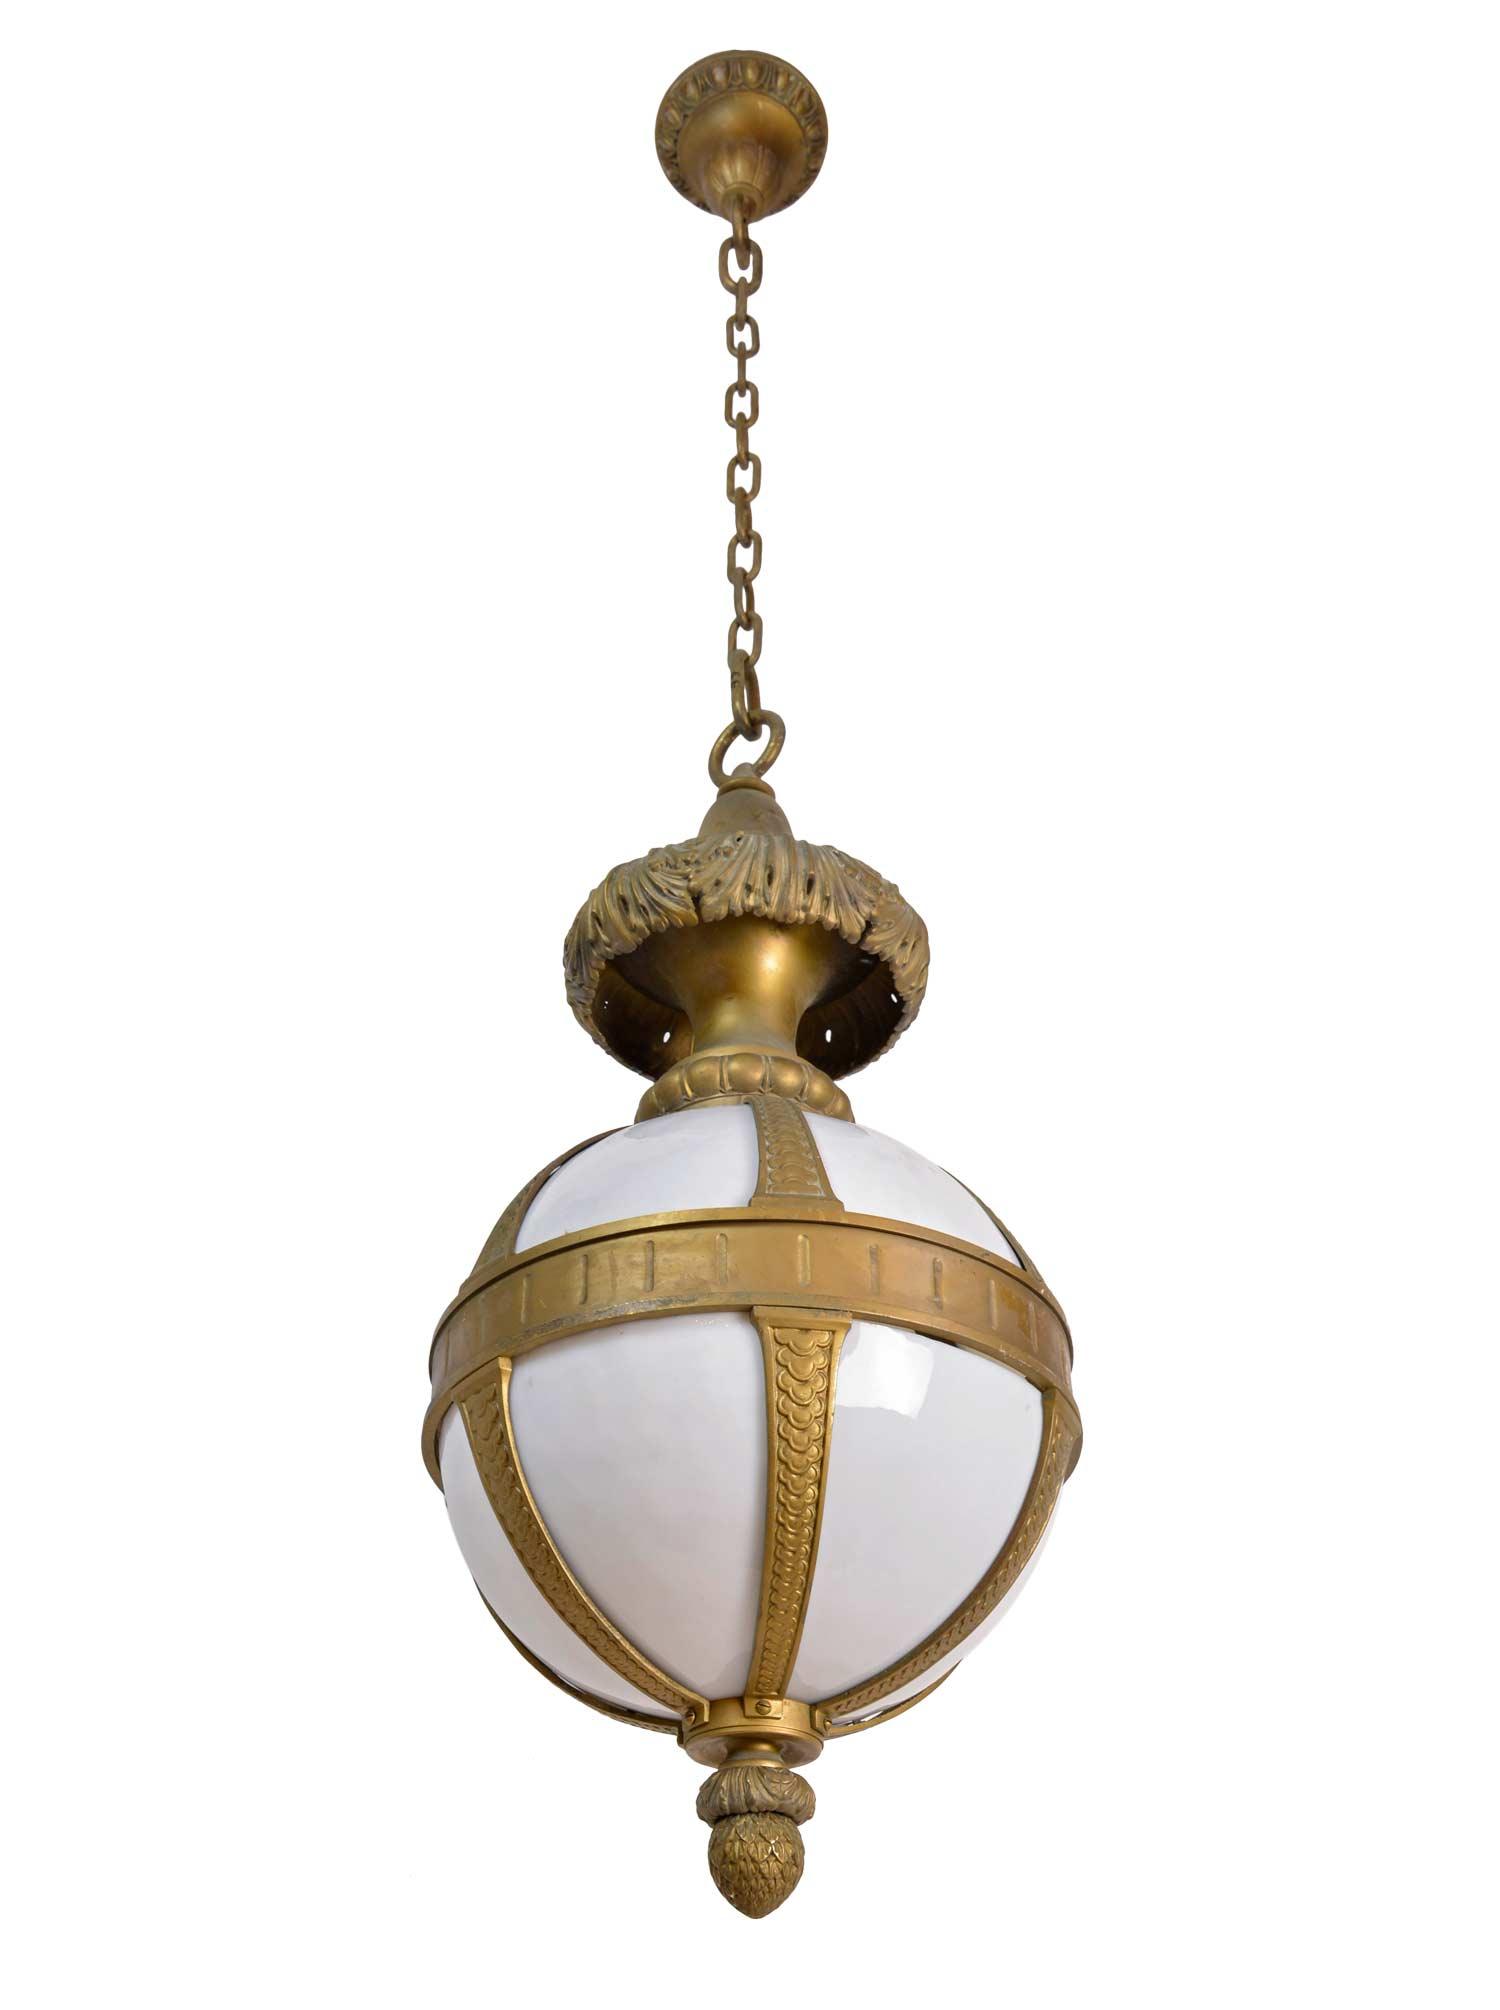 46136-Brass-Light-with-Bent-Glass-angle.jpg